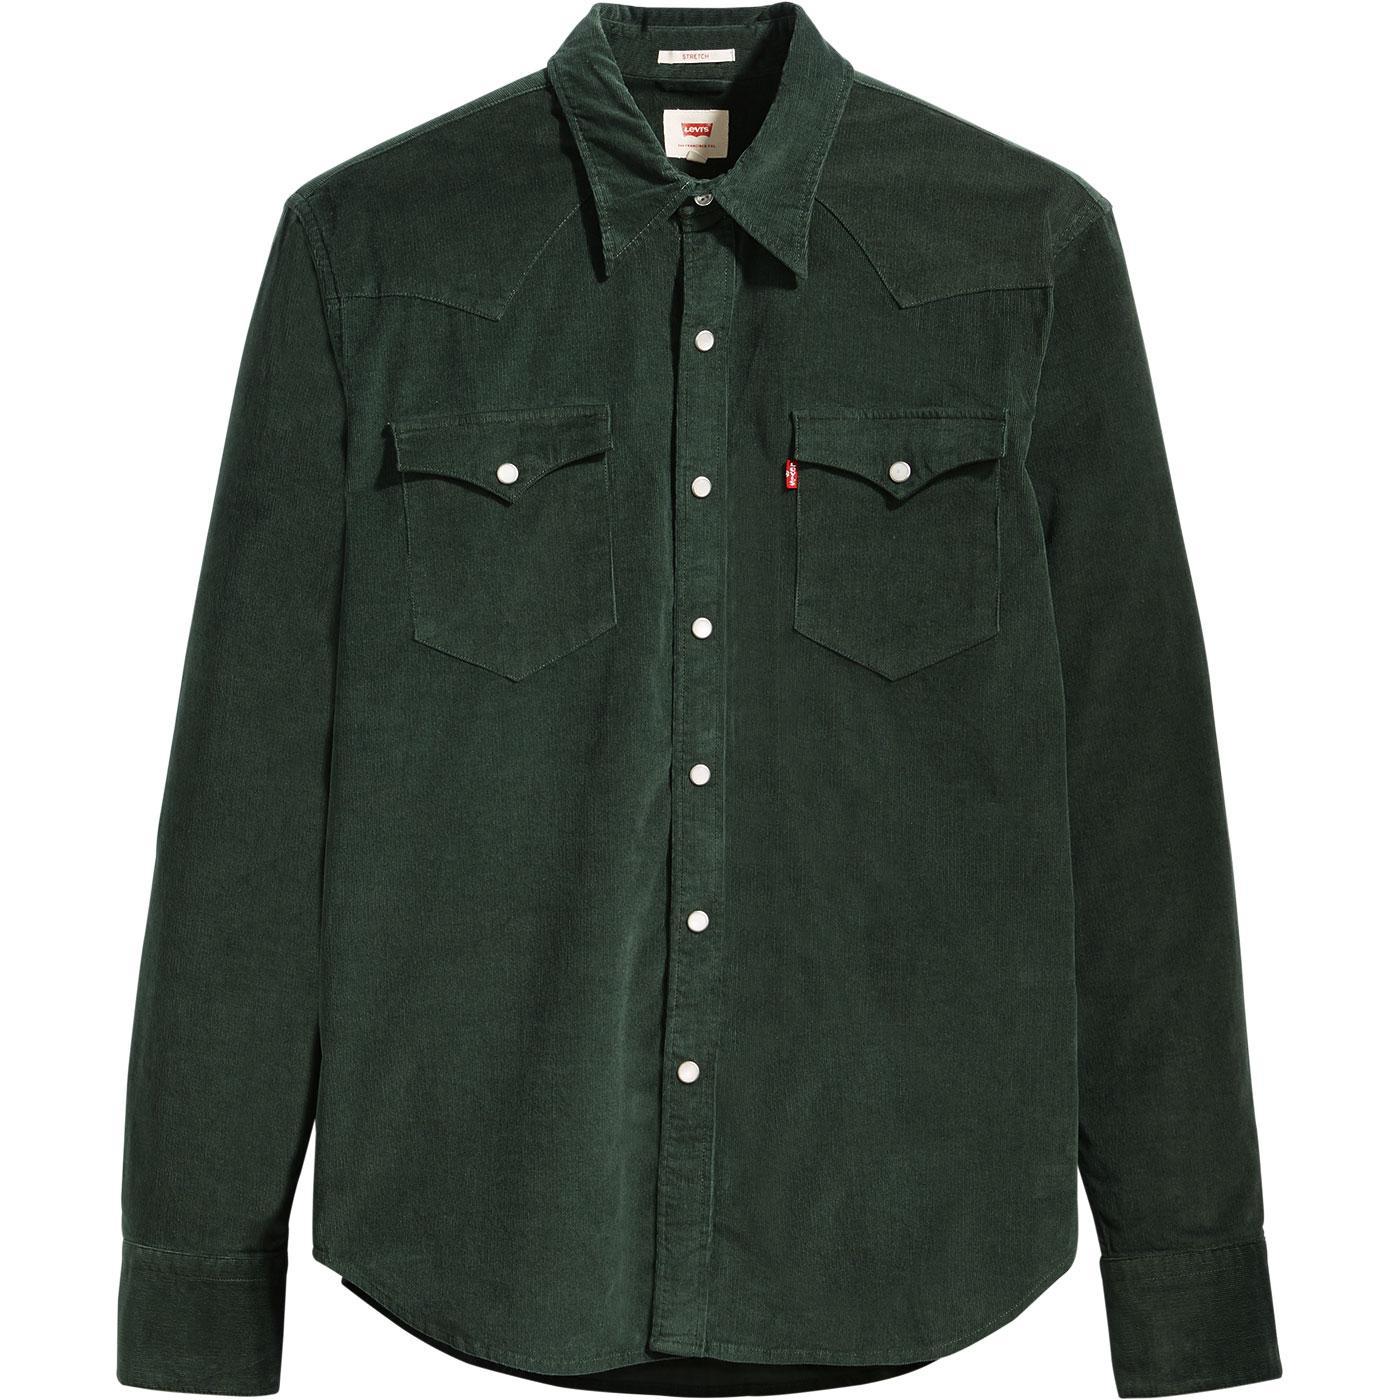 LEVI'S Men's Retro 70s Pin Cord Shirt PYTHON GREEN